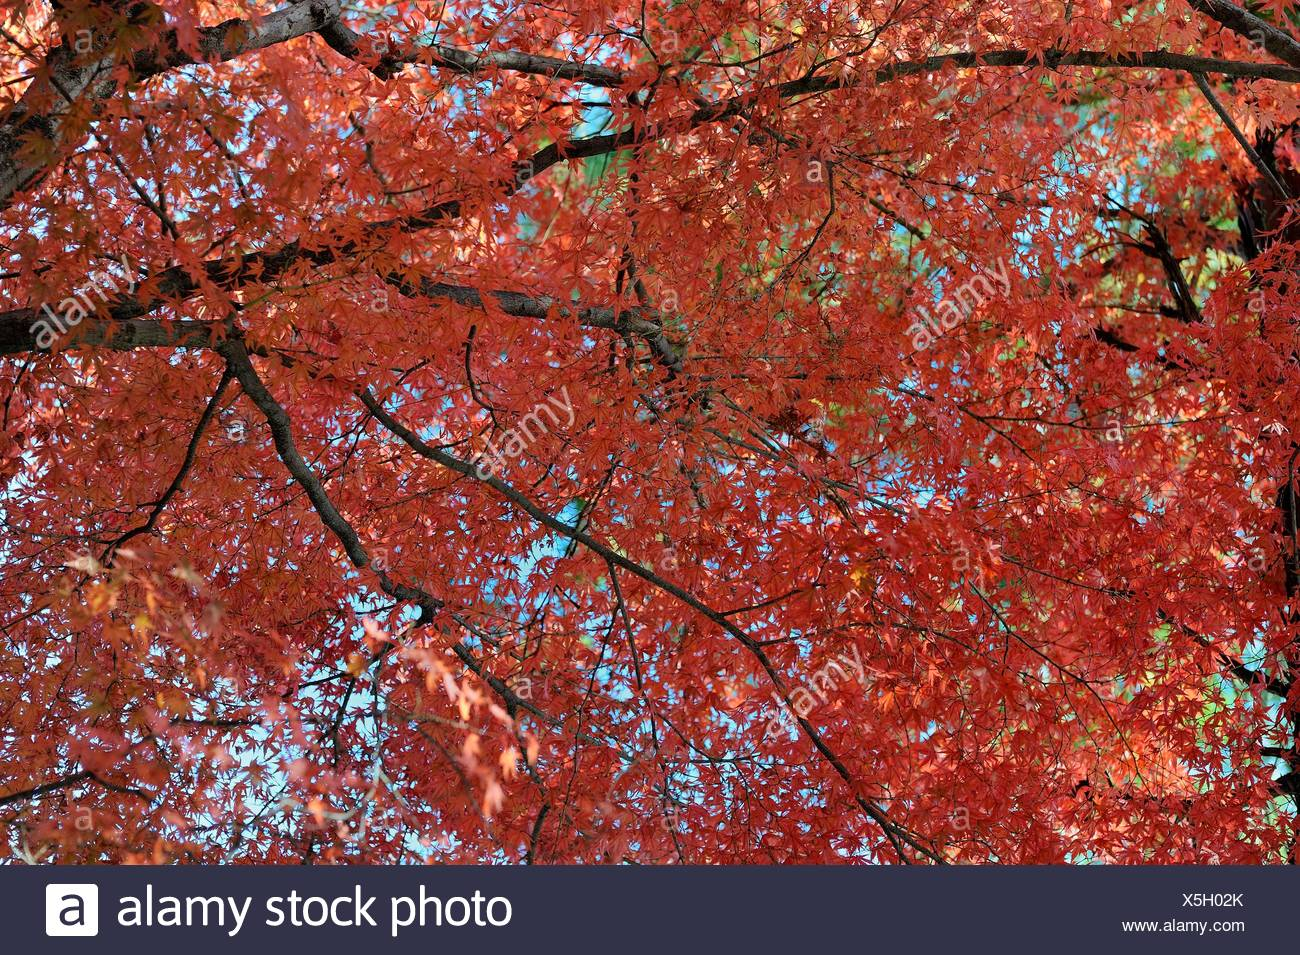 Japanese Maple (Acer palmatum) with red foliage in autumn, Kyoto, Kinki region, Japan - Stock Image